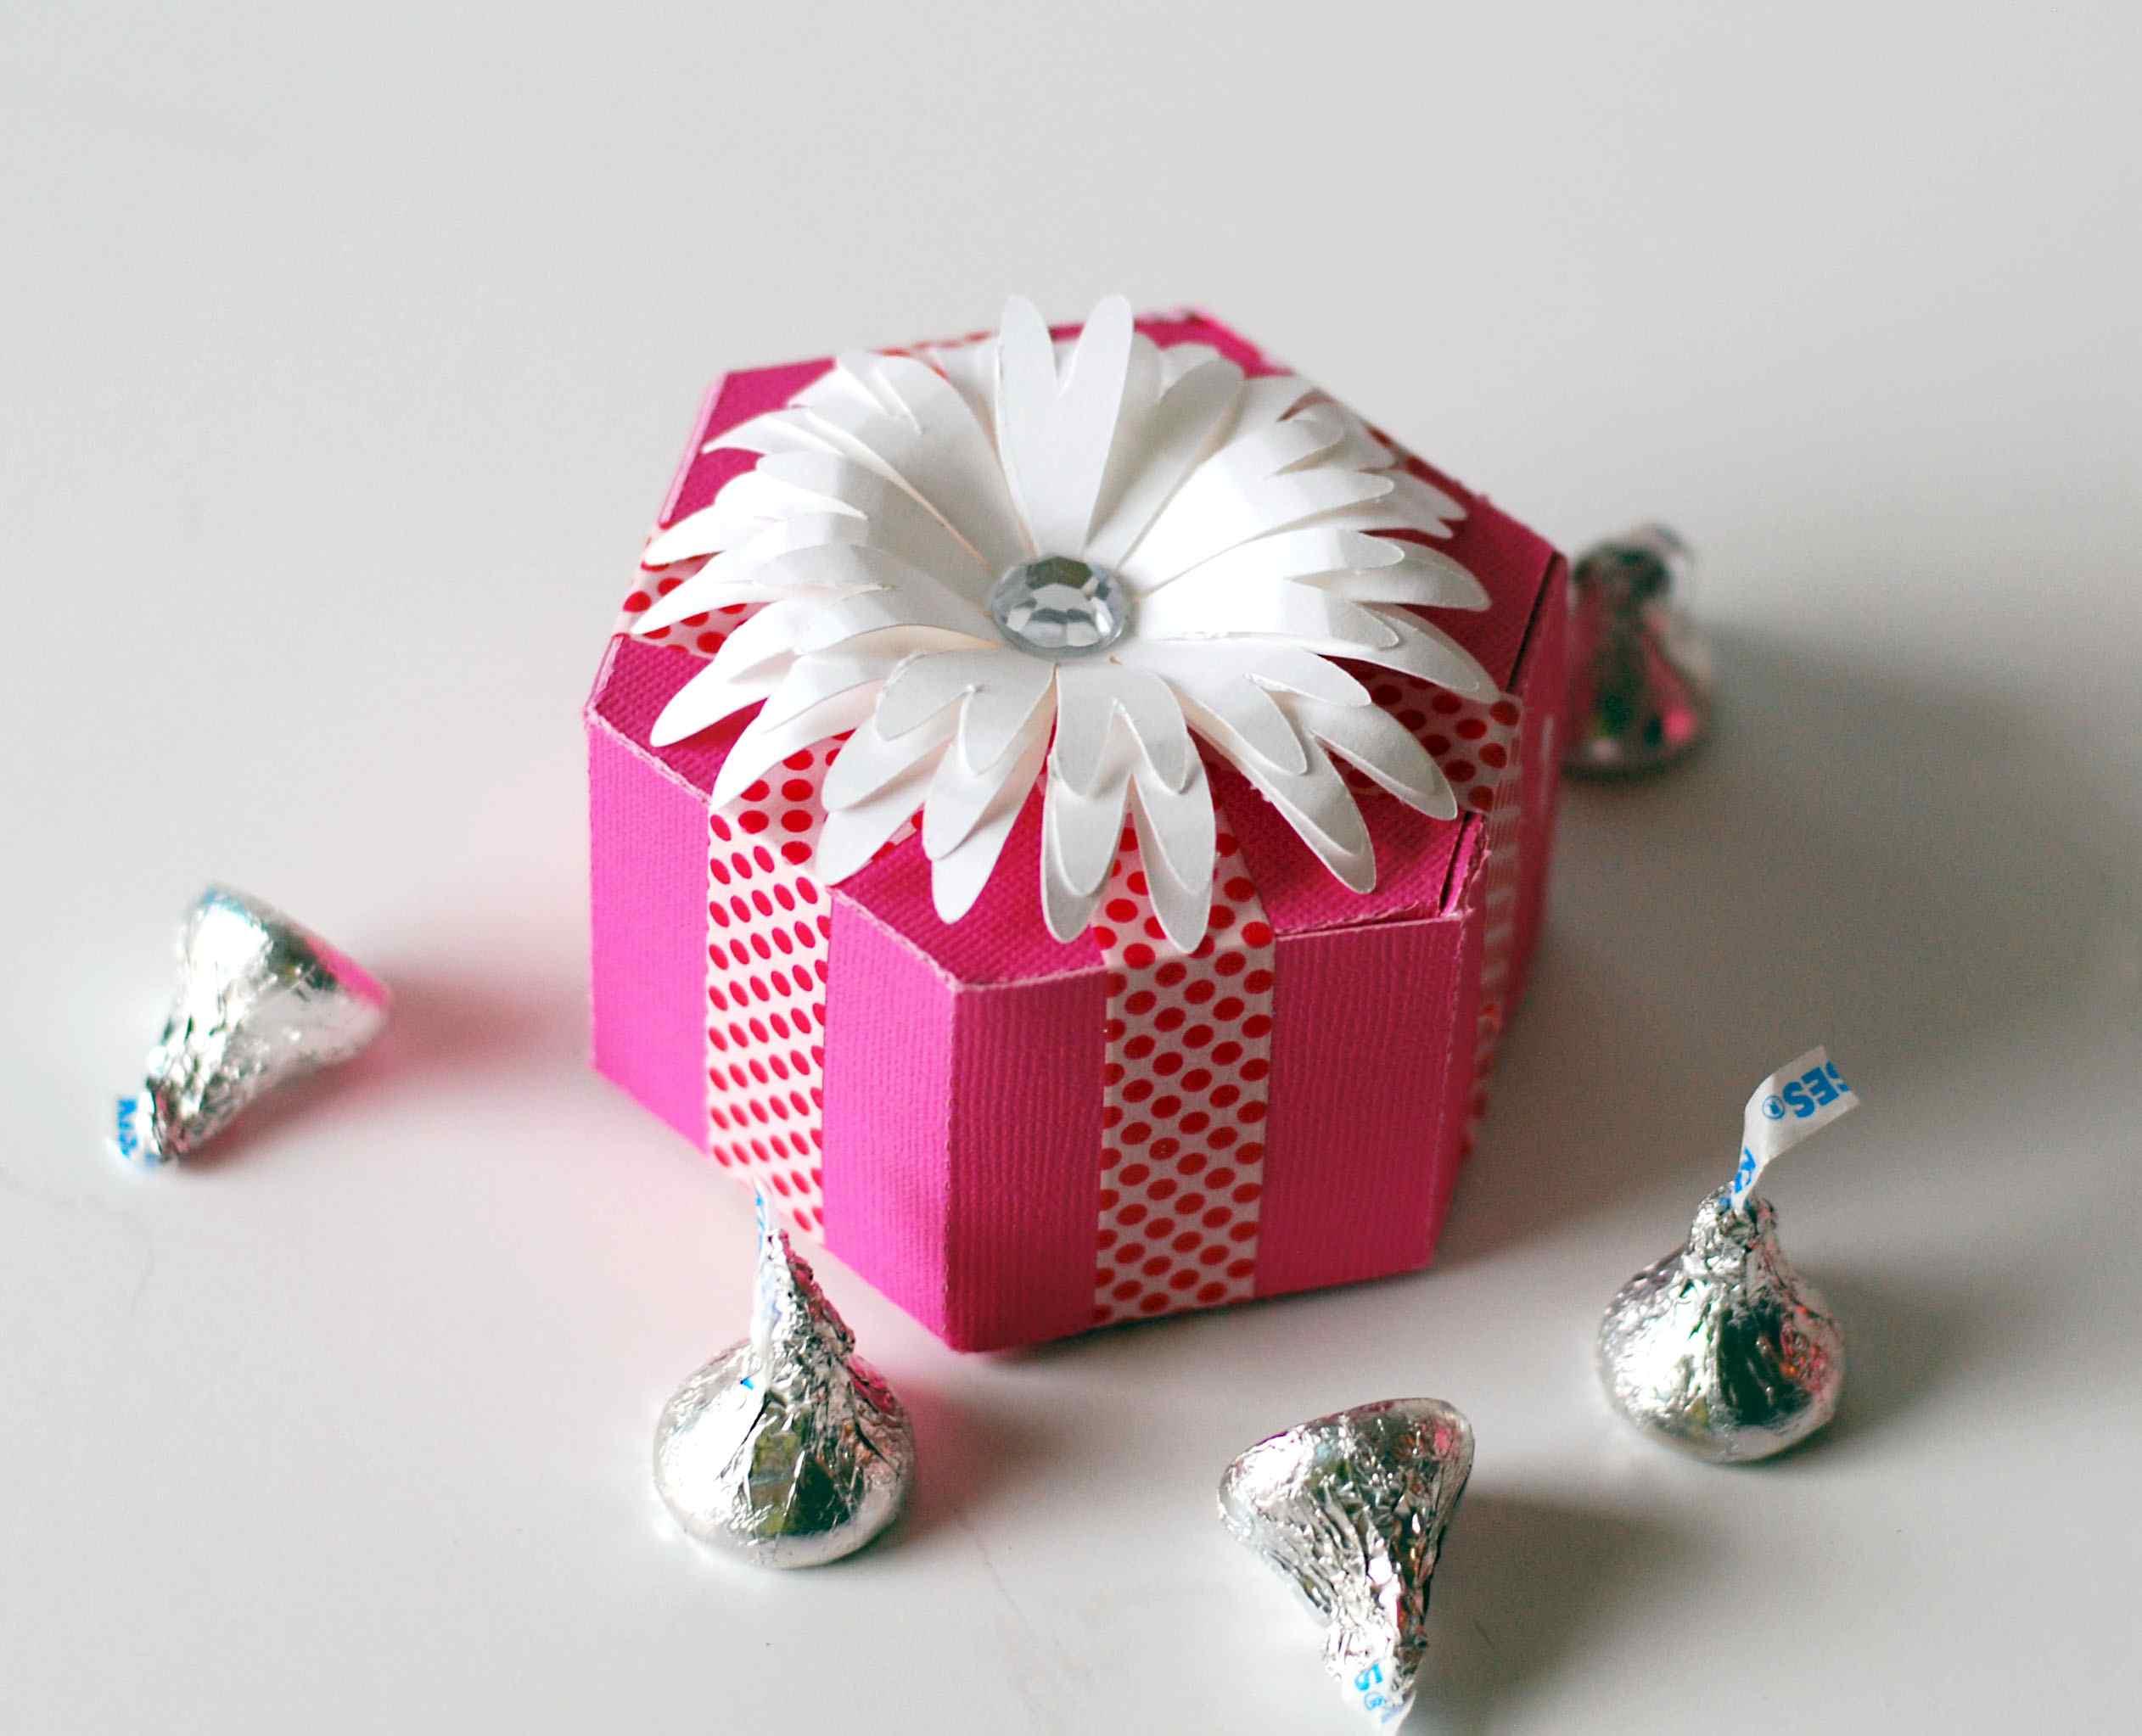 How To Make A Cute Hexagon Shaped Gift Box